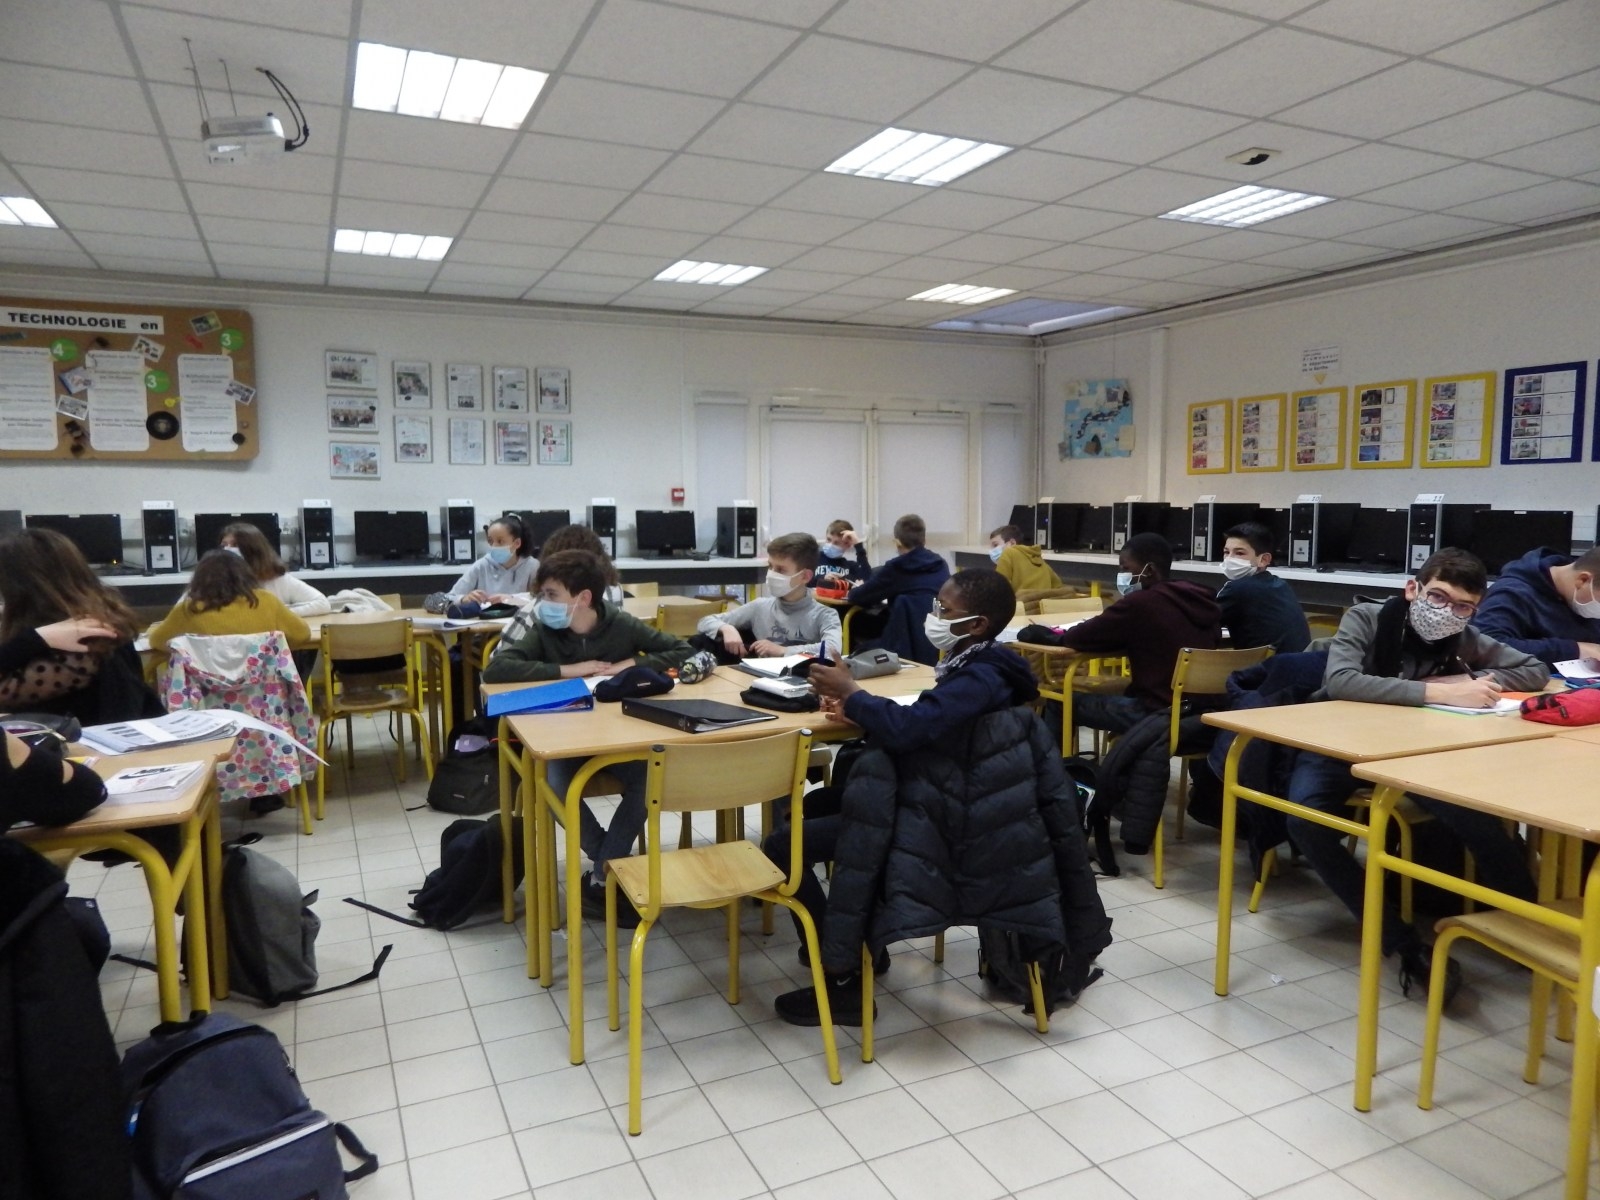 Salle de technologie n°1